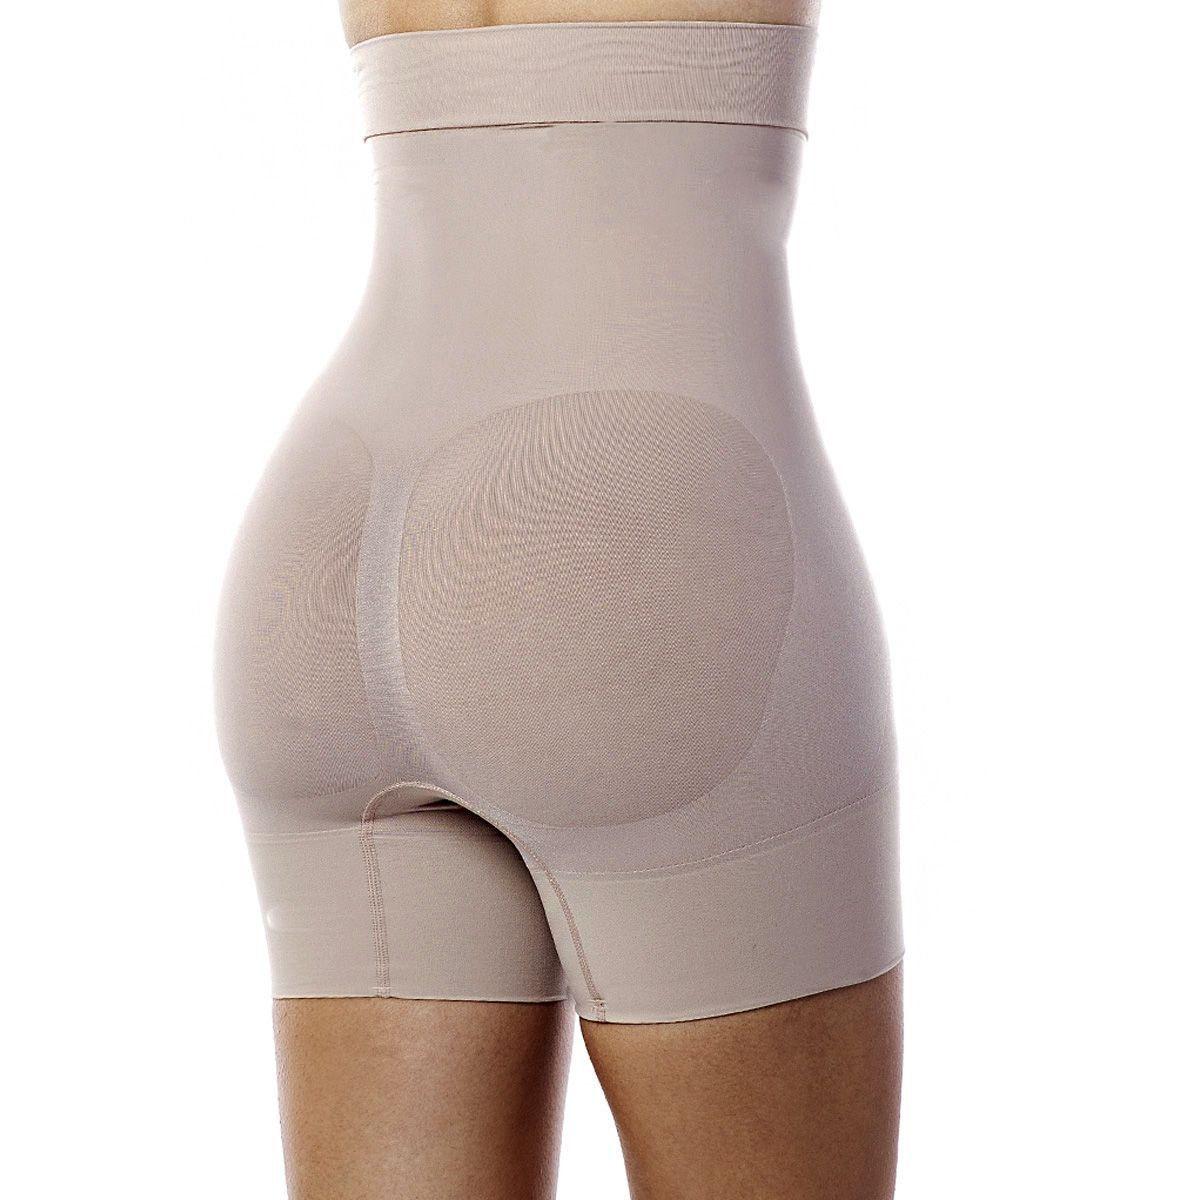 Short Feminino Loba Skin Compression Afina a Cintura